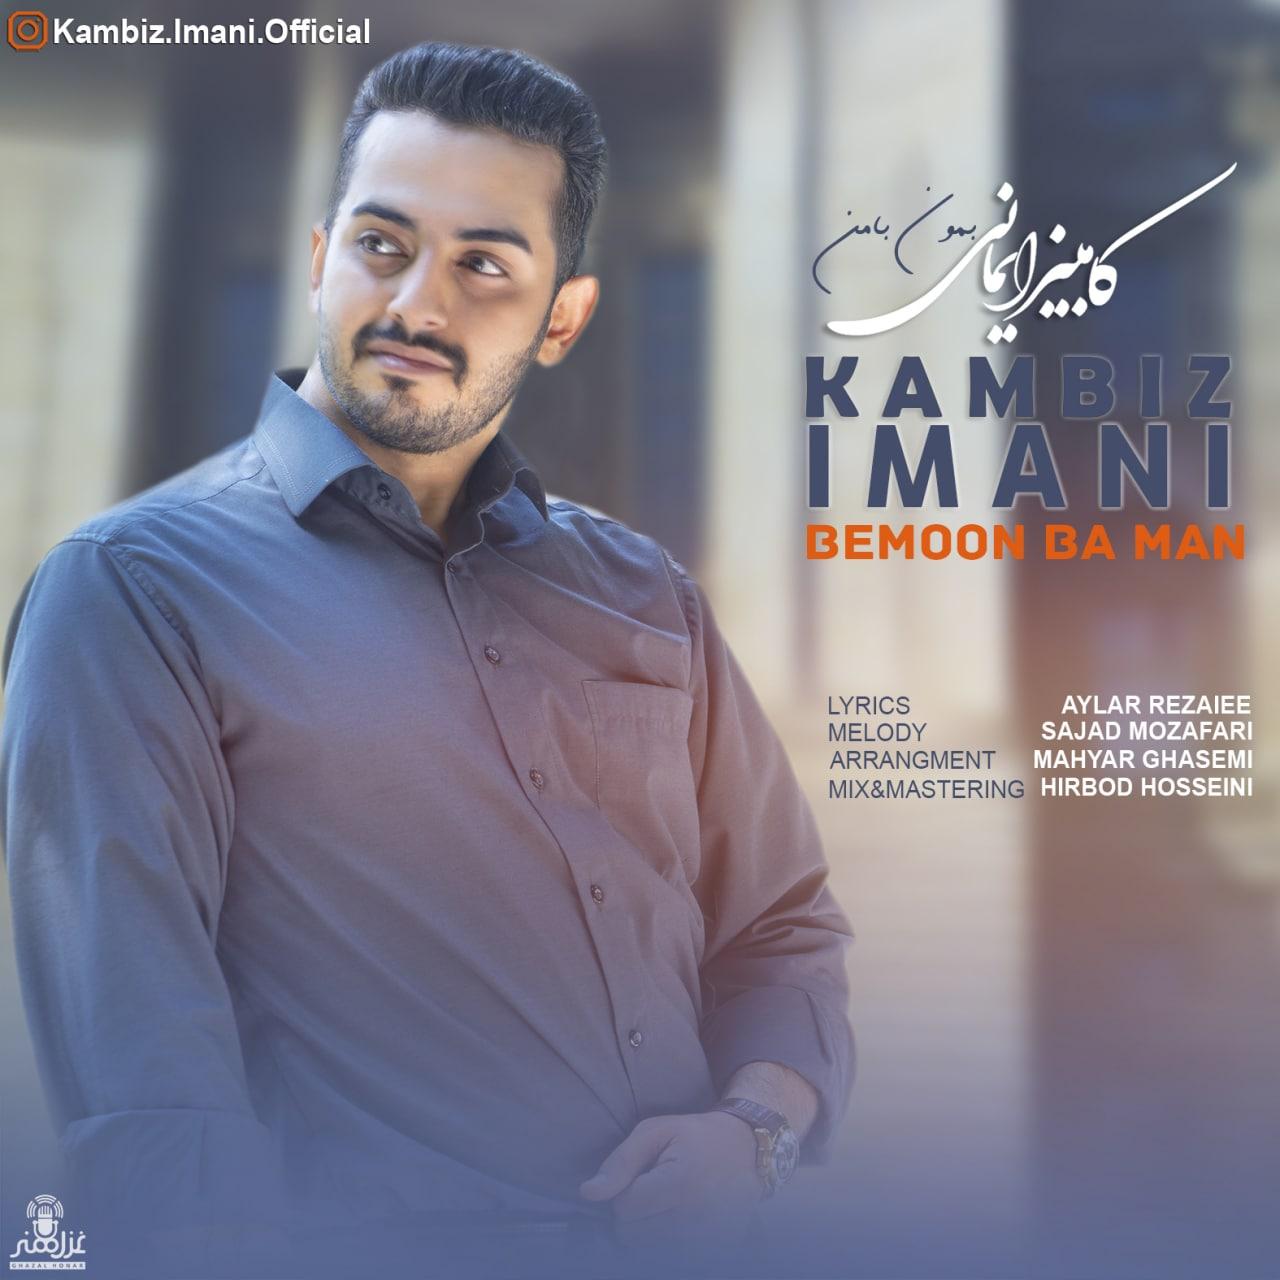 Kambiz Imani – Bemoon Ba Man